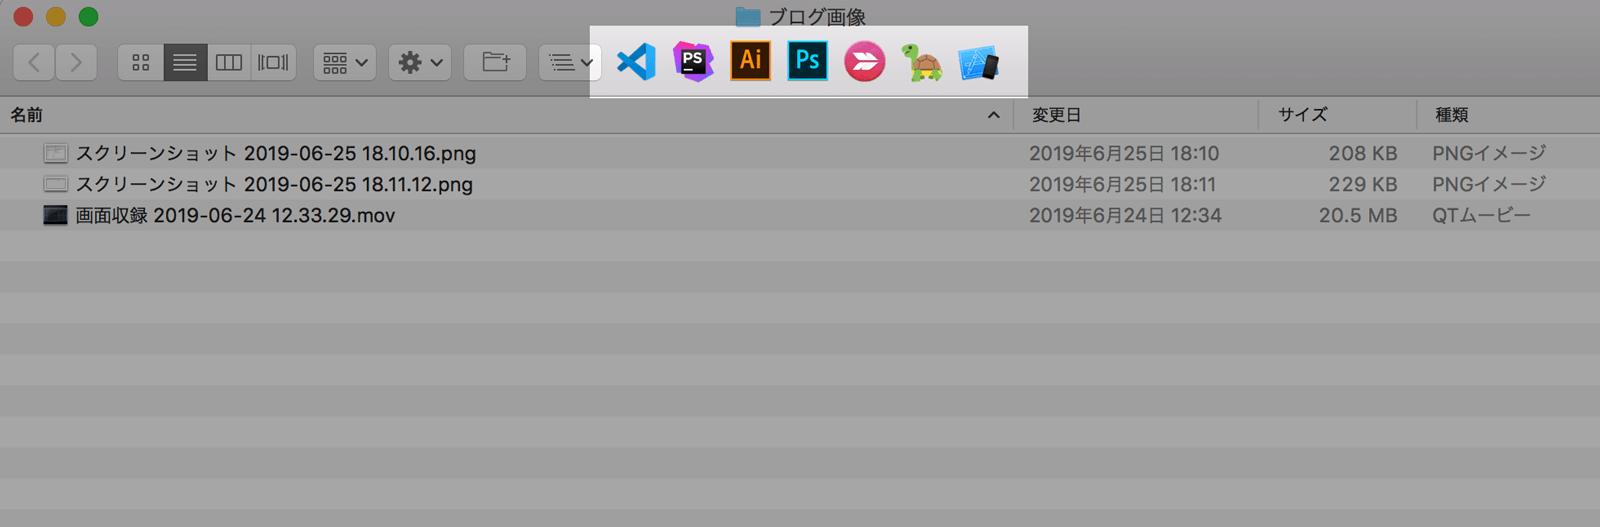 Finder上部にアプリアイコンを登録できる